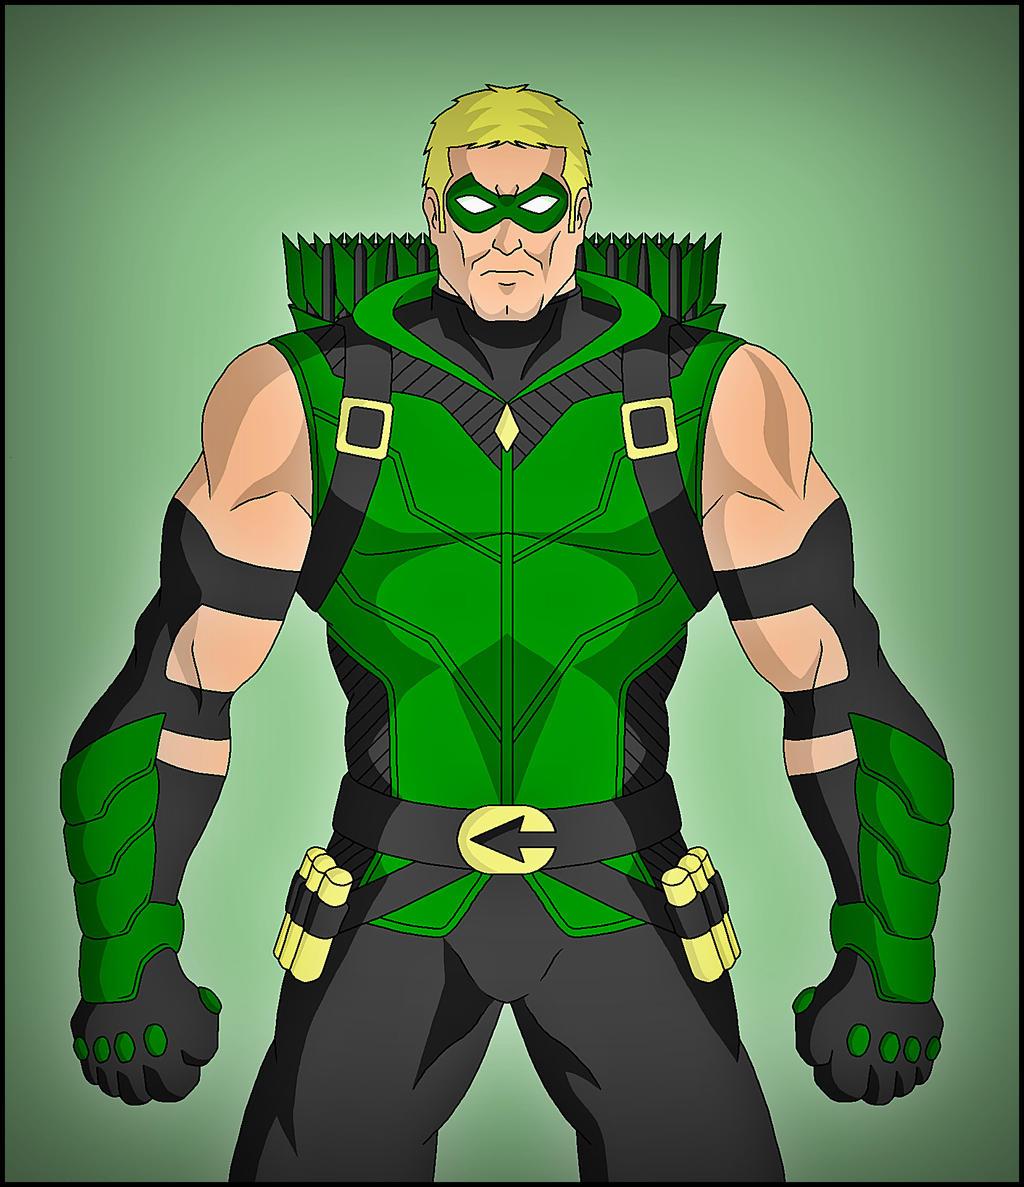 Green Arrow New 52 Wallpaper Green Arrow - The New 52 by